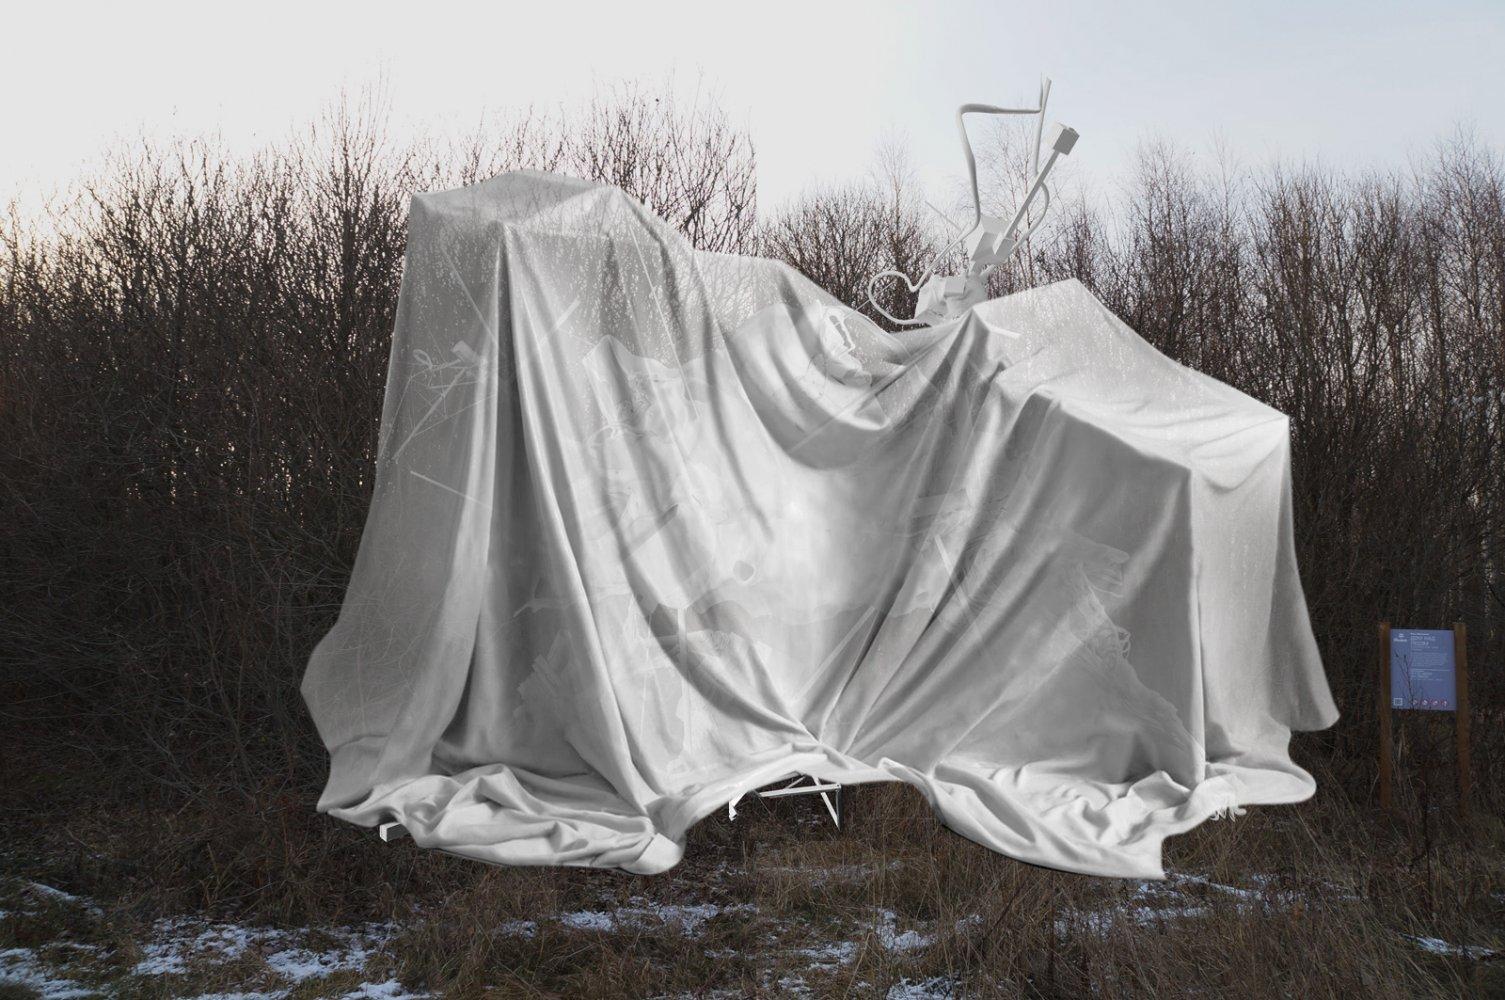 На «АРХСТОЯНИИ – 2016» 5 художников и 5 архитекторов представят объекты на тему «Убежище»